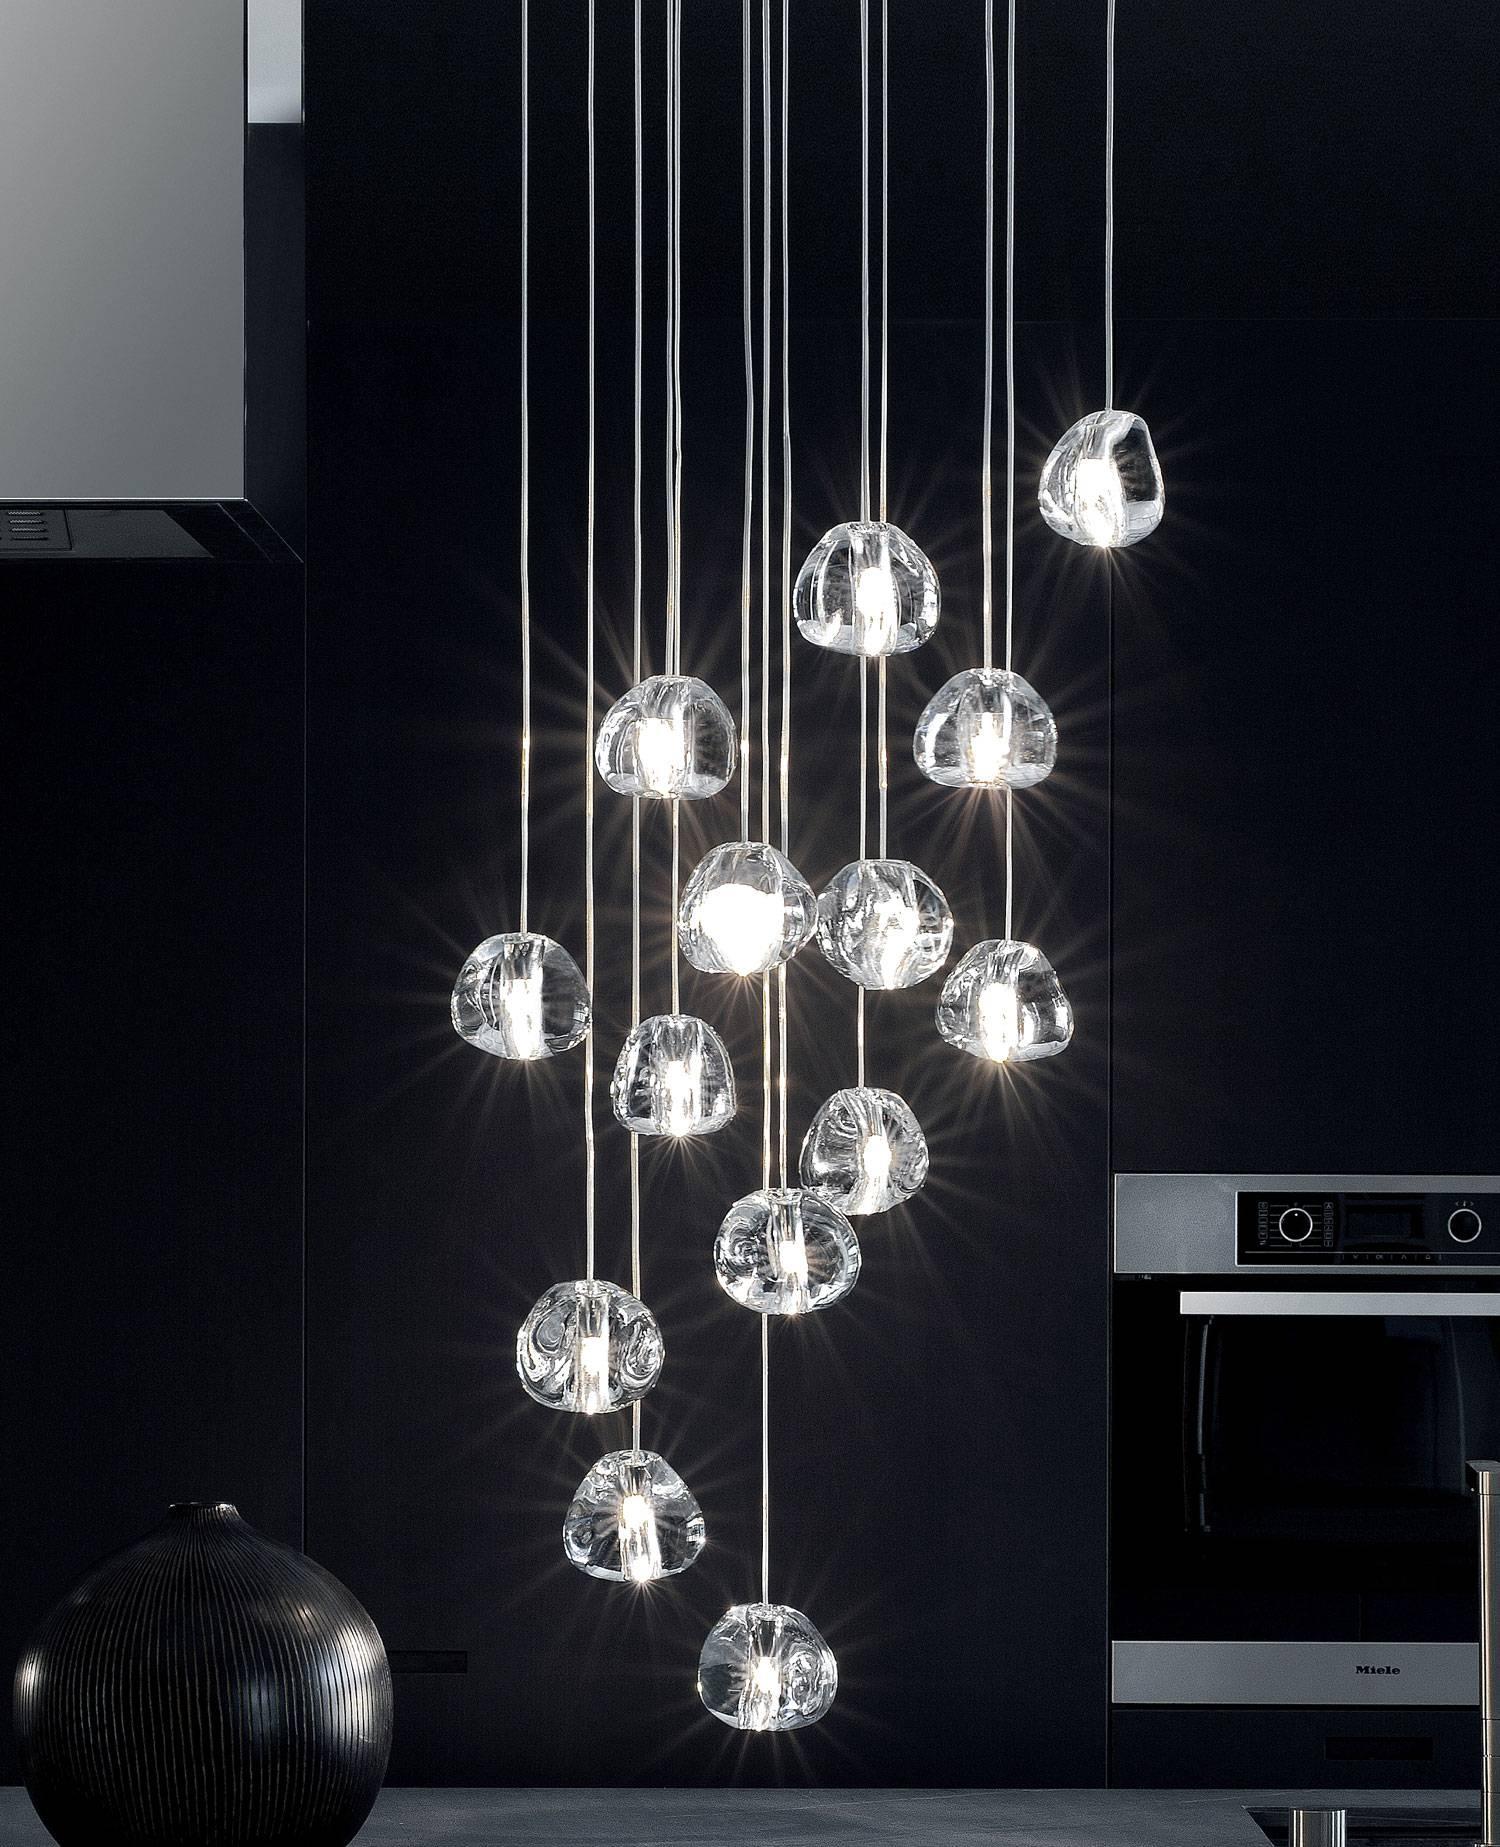 Mizu R15S Pendant Lightterzani | Interior-Deluxe with Mizu Pendant Lights (Image 7 of 15)